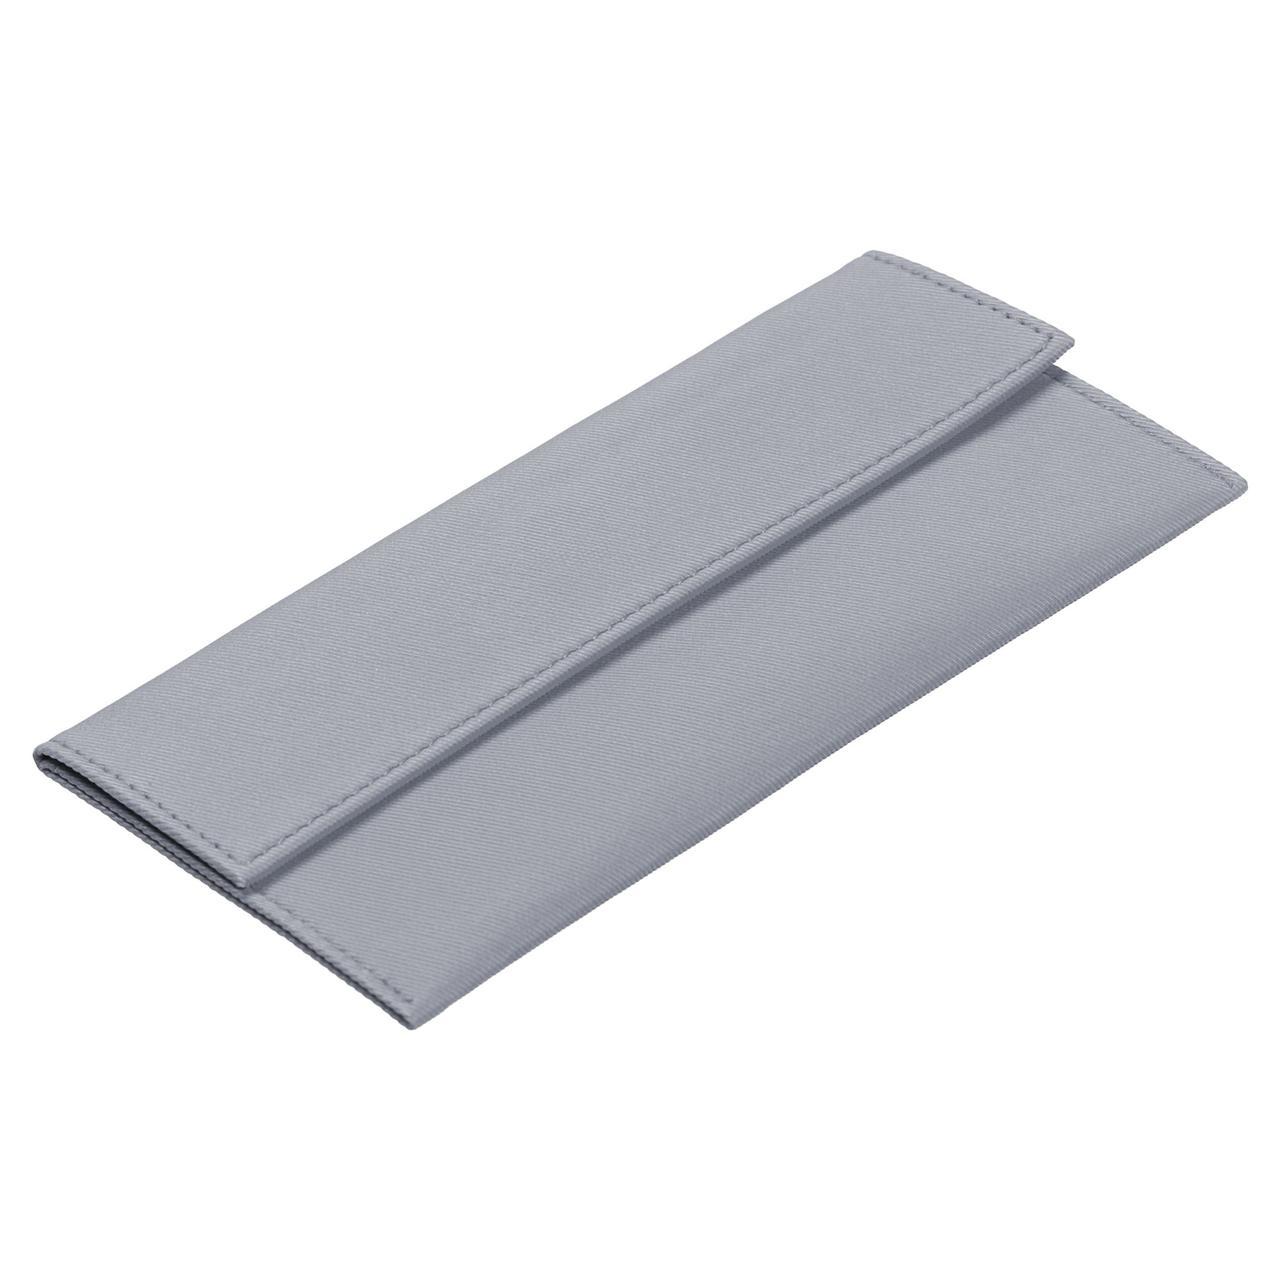 Чехол универсальный Twill, серый (артикул 4076.10)